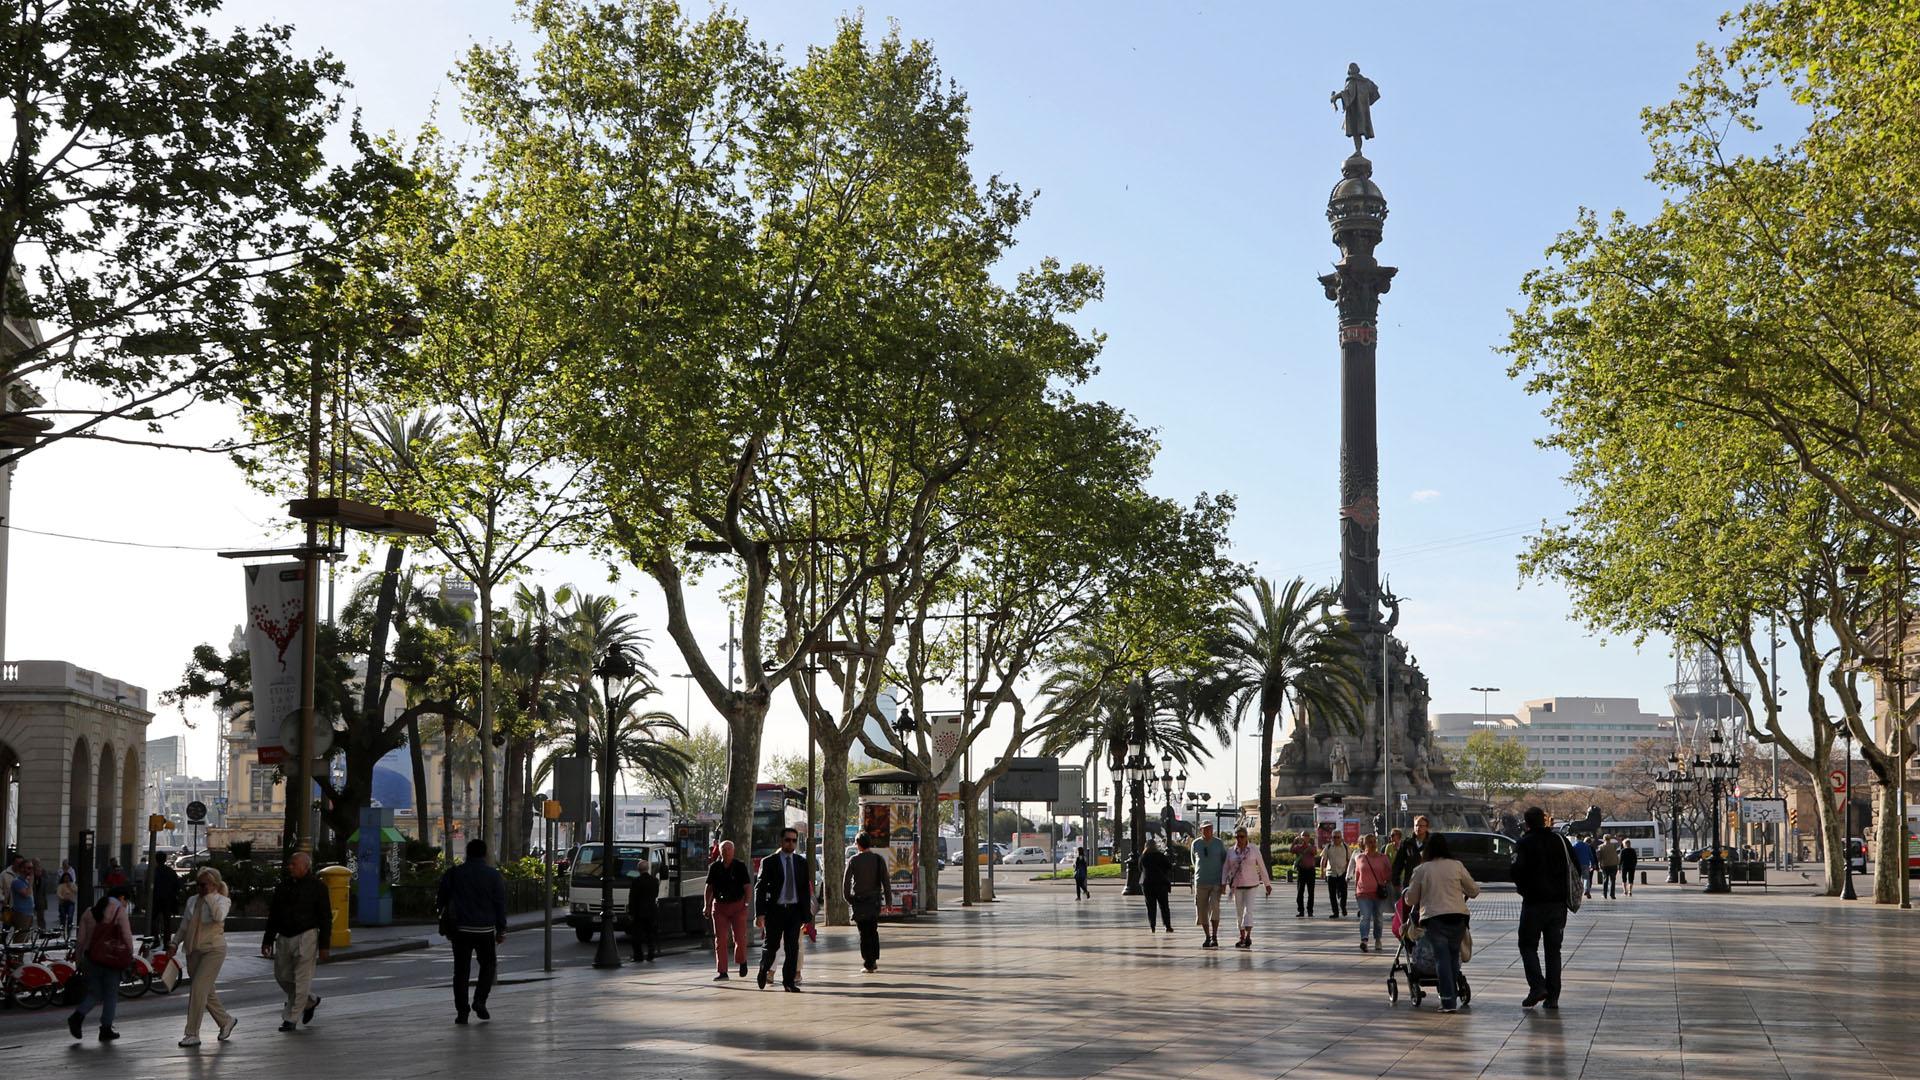 Näin saat eniten irti Barcelonan Gaudi-kohteista.